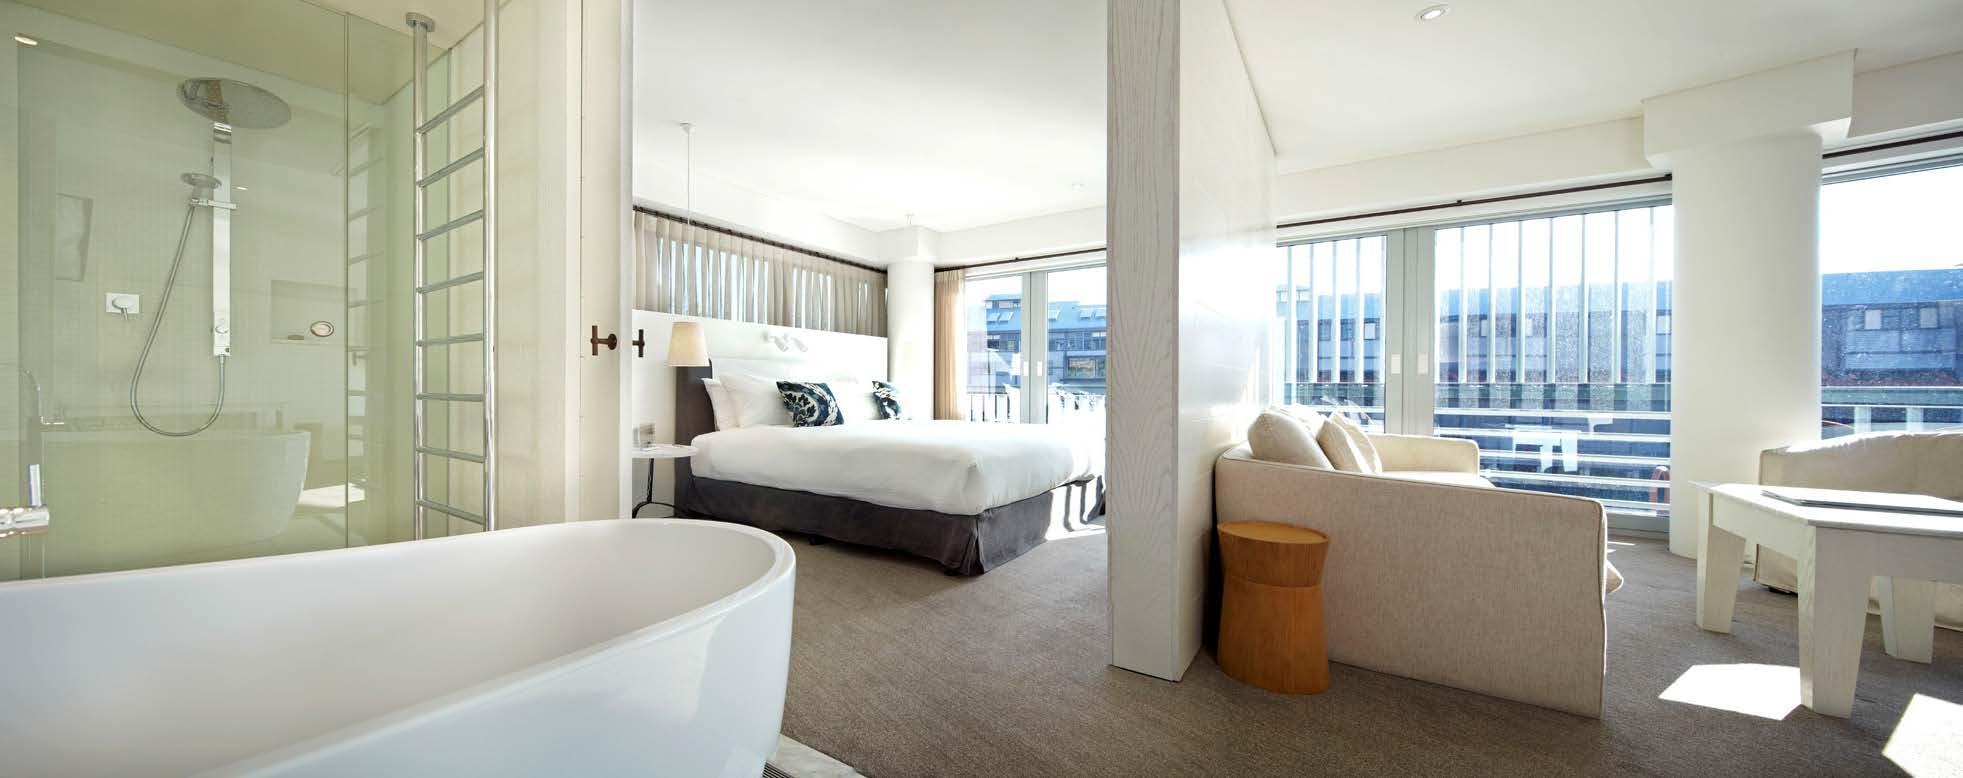 CIVAS Hospitality & Leisure Services Group